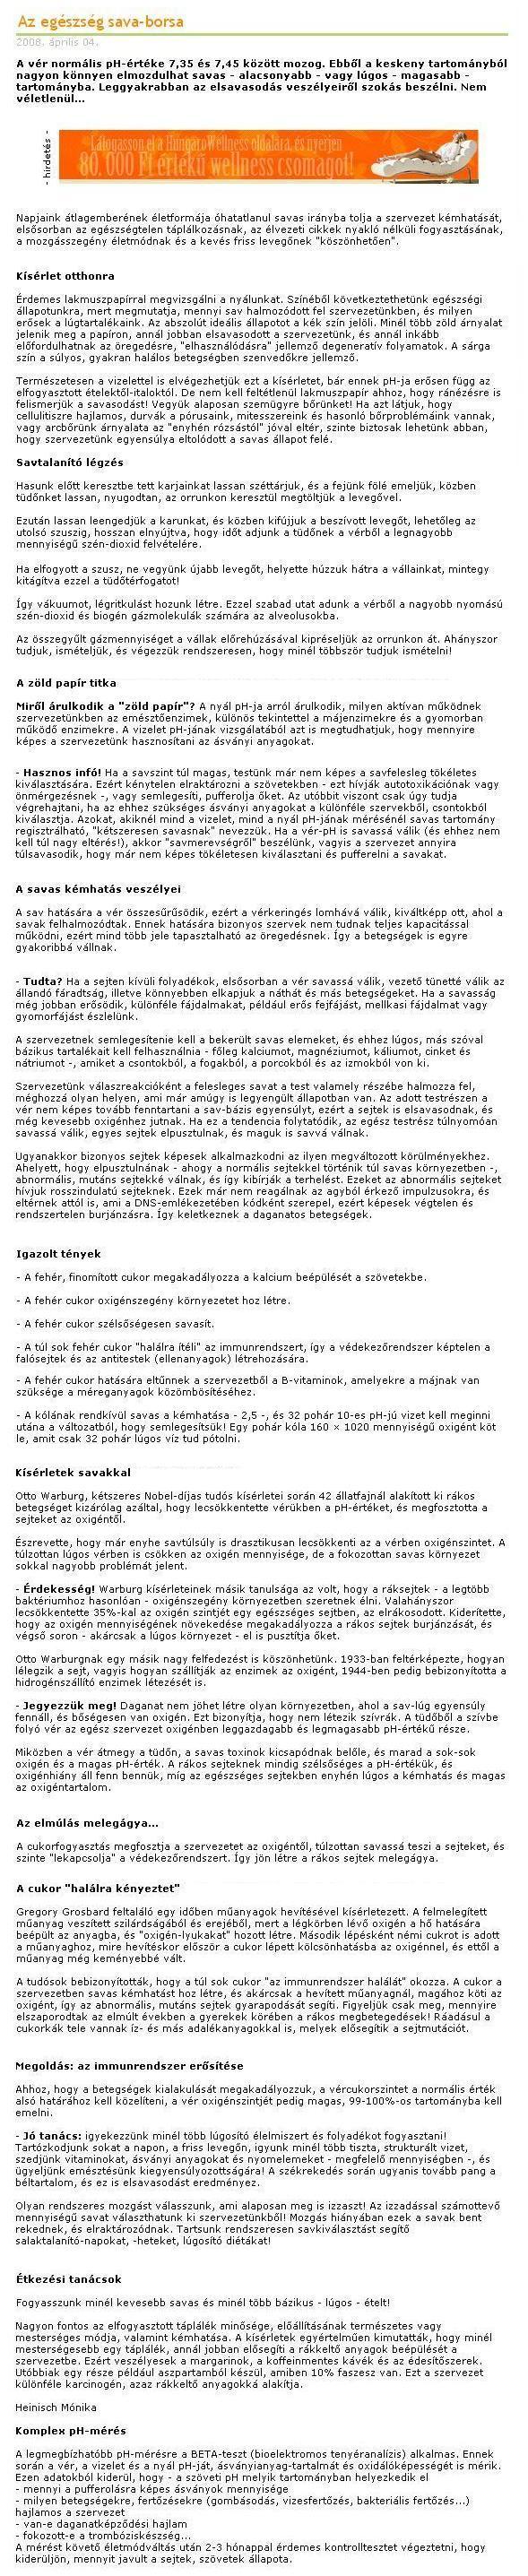 Heinisch_Monika_cikke_a_lugositasrol